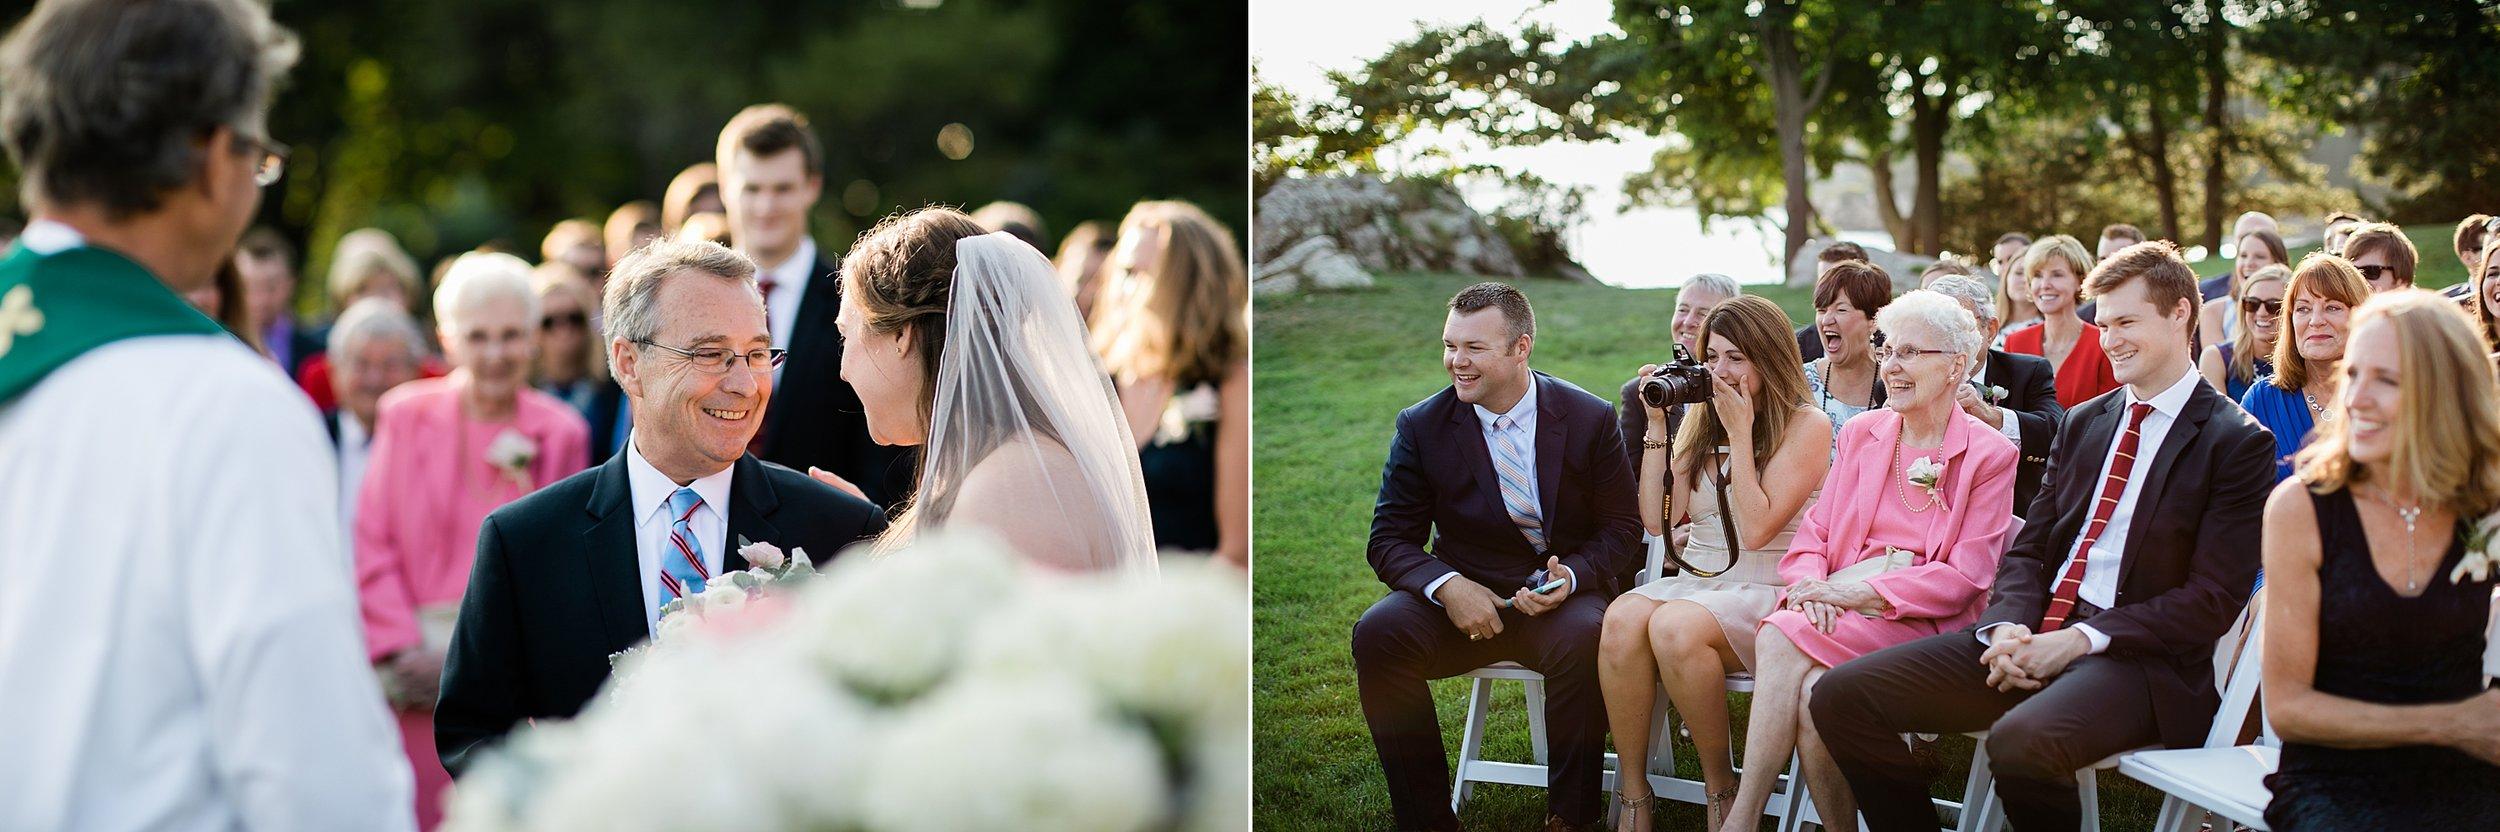 028 los angeles wedding photographer todd danforth photography boston.jpg